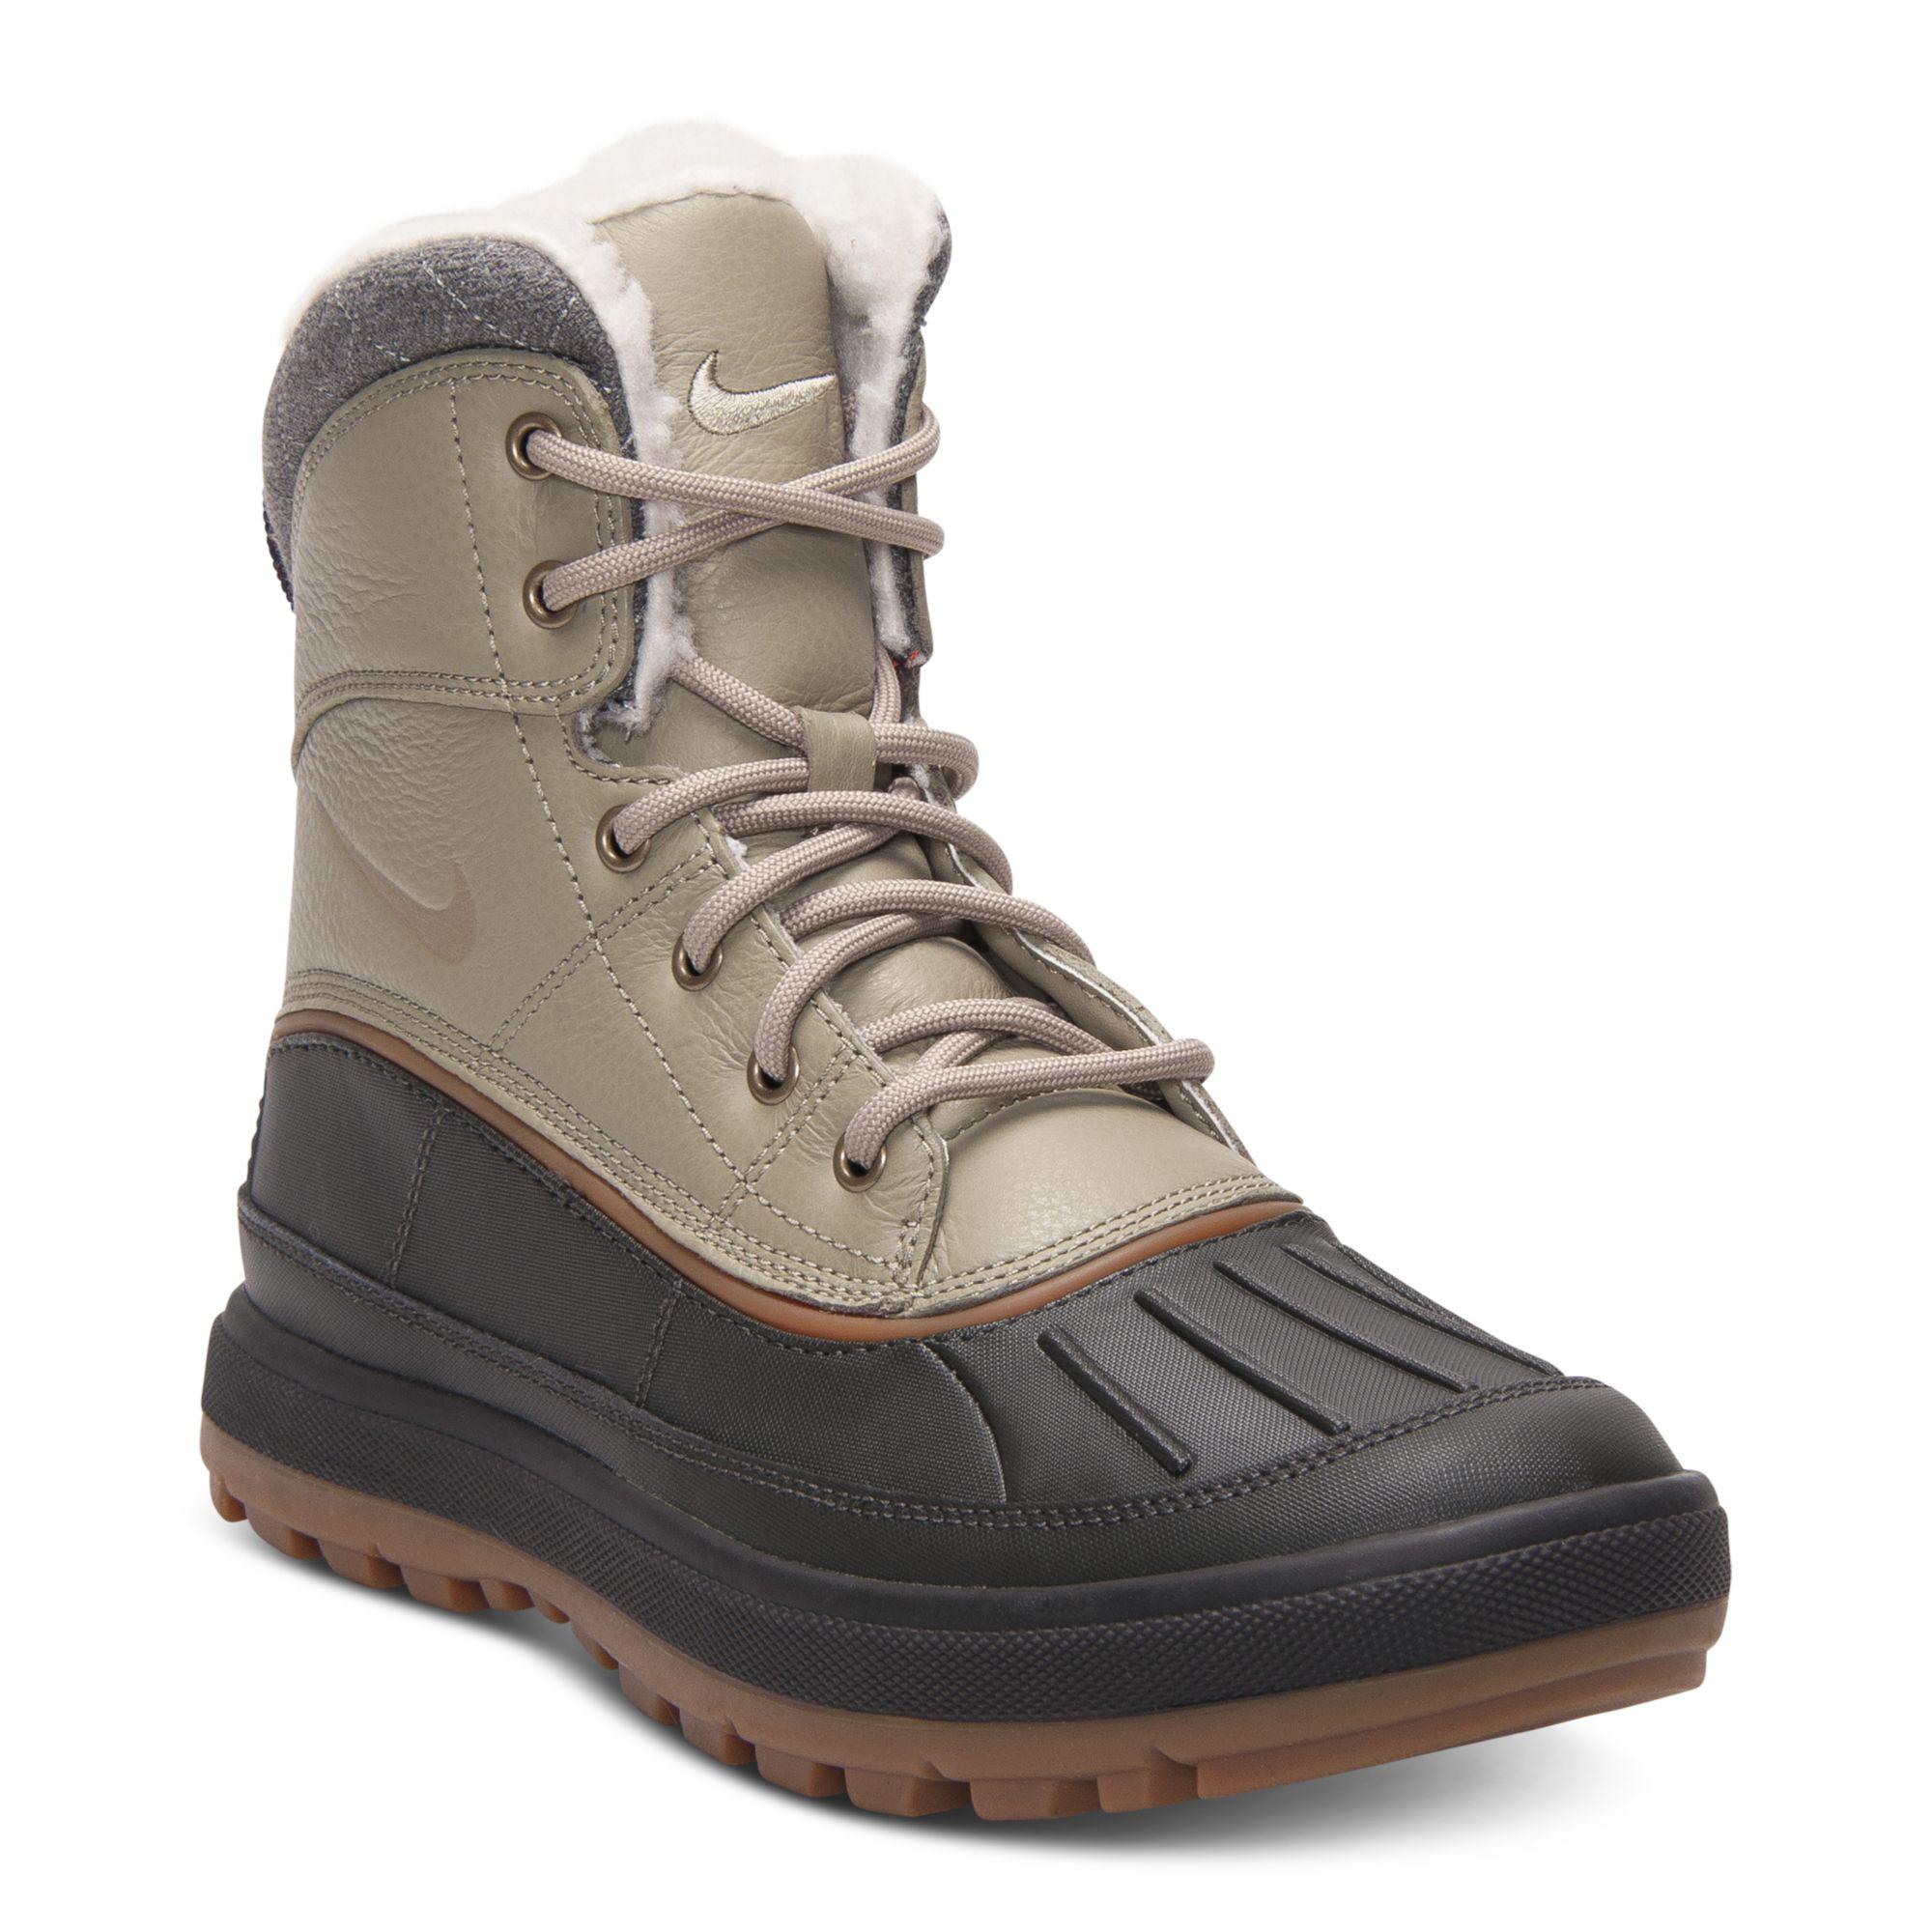 Nike Woodside Ii Outdoor Boots In Black For Men Bamboo Newsprint Lyst